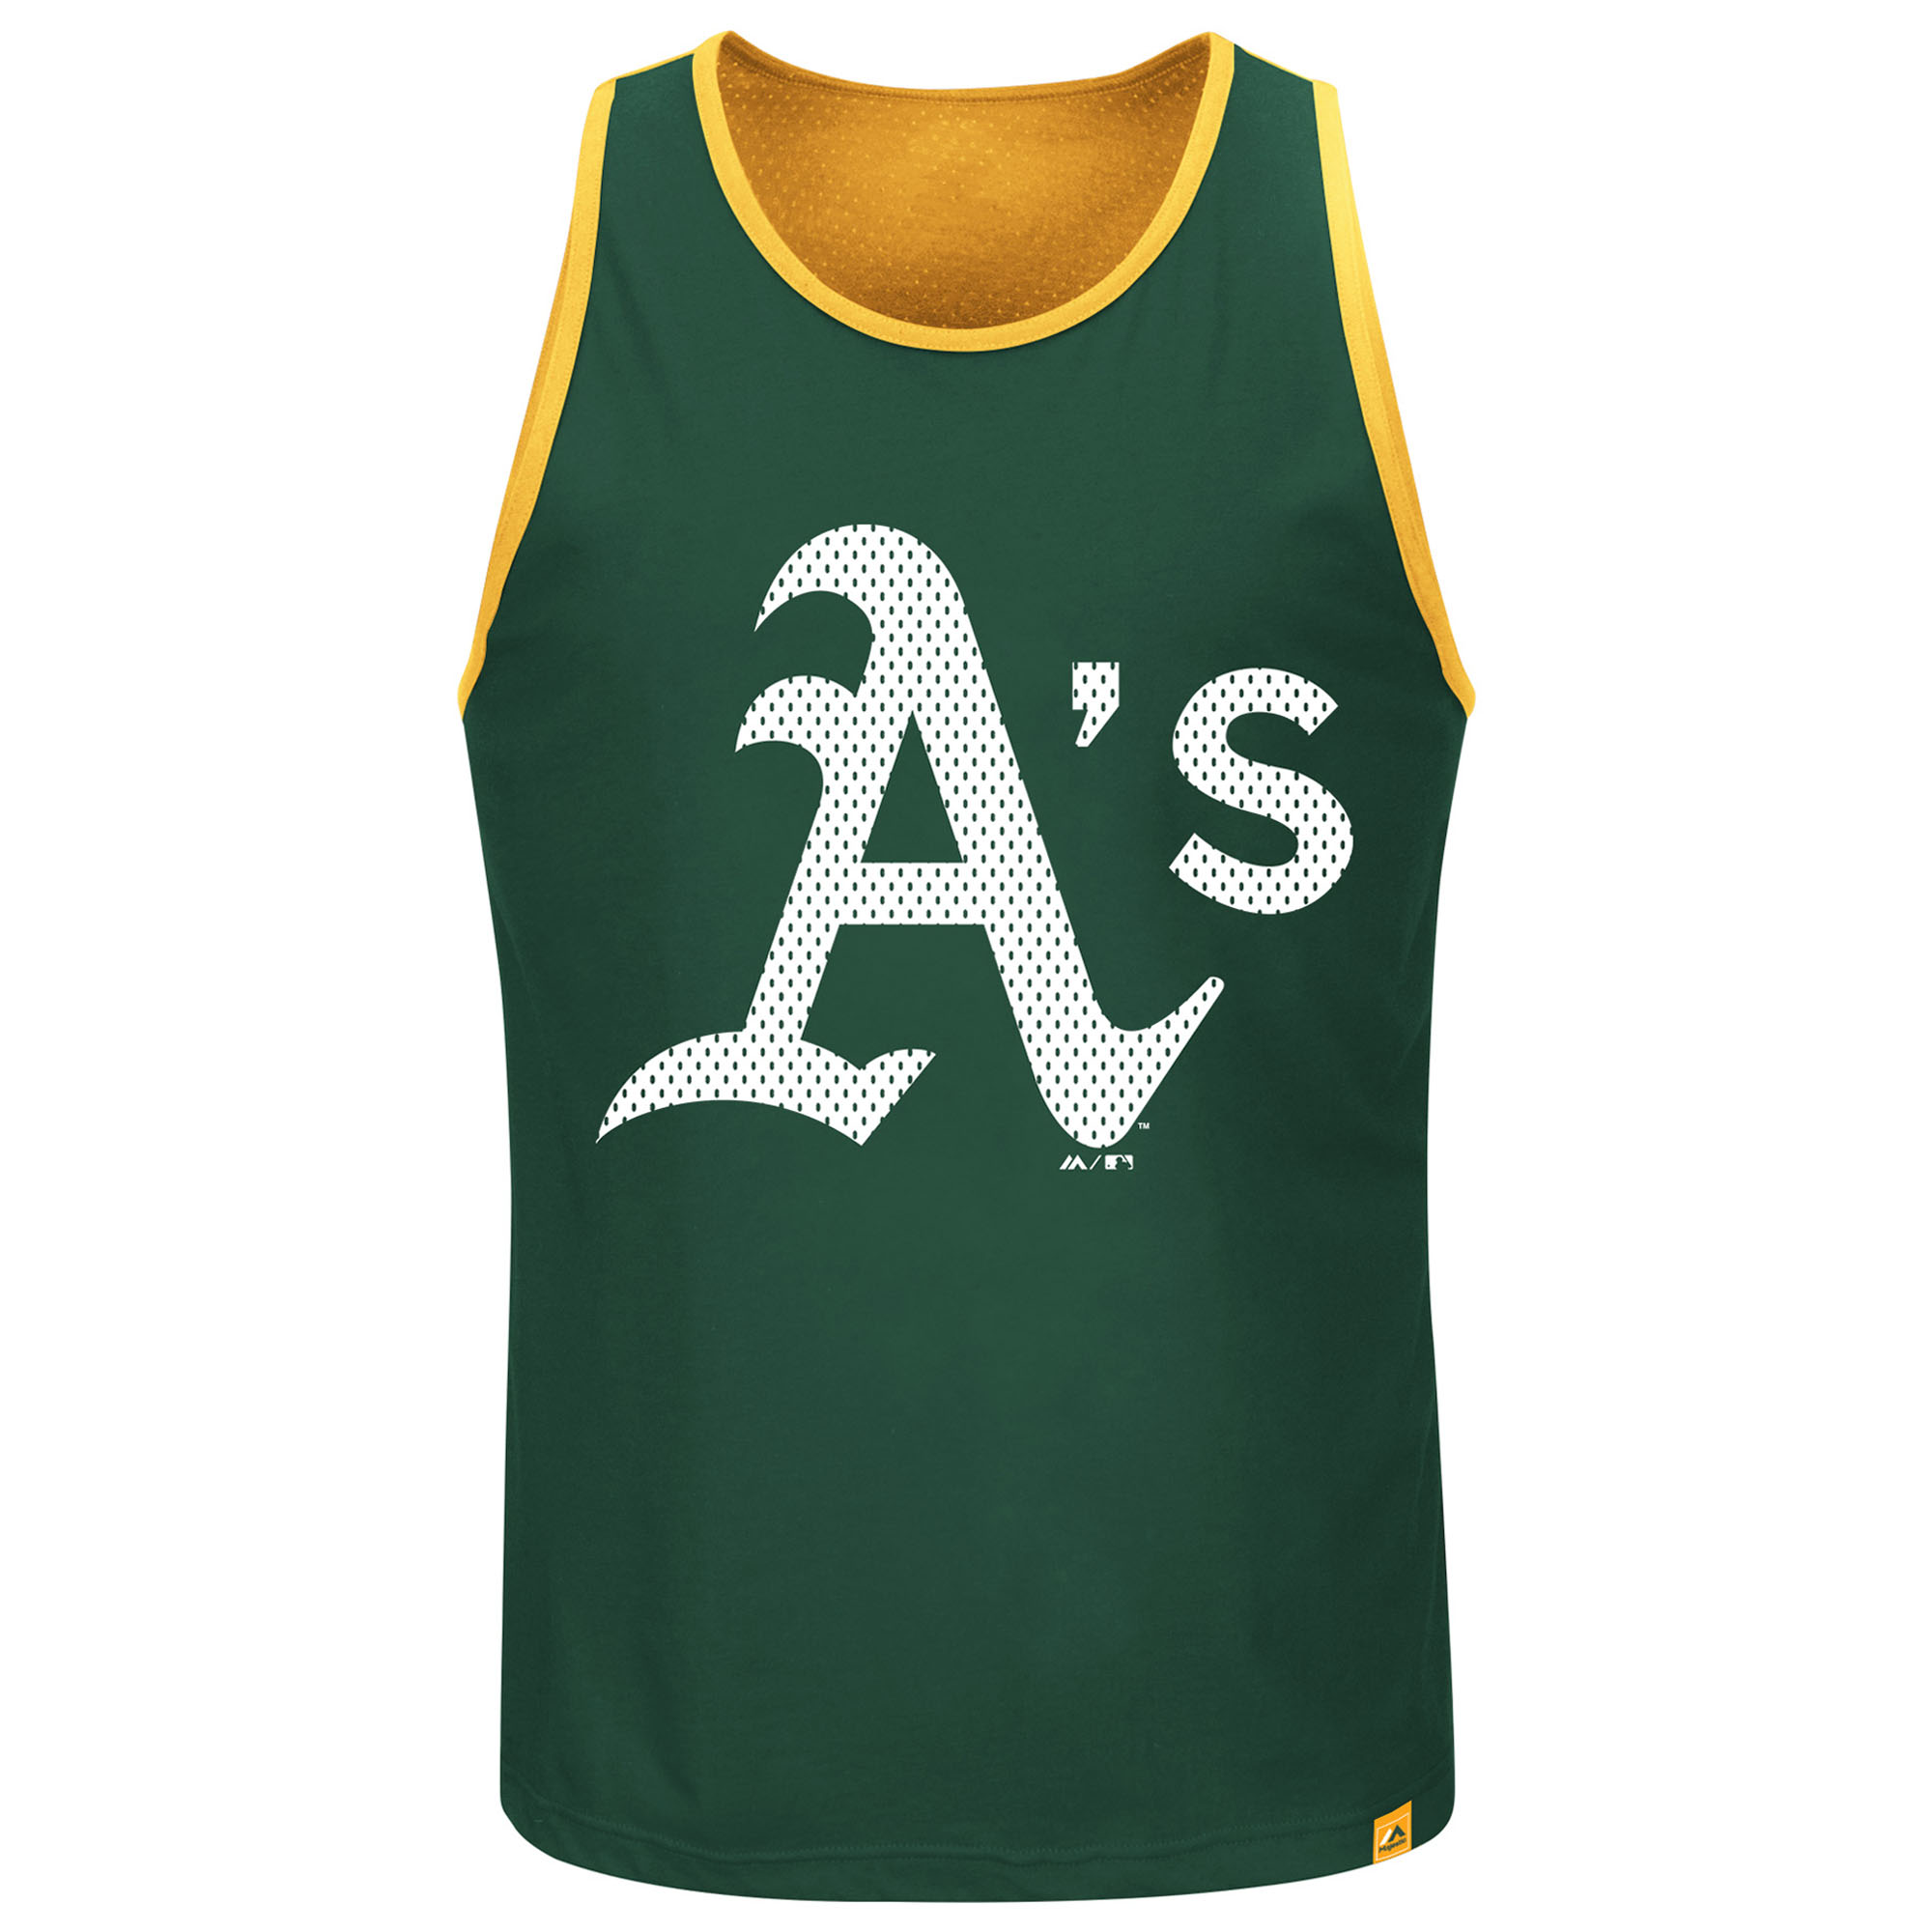 Oakland Athletics Majestic All Last Season Tank Top - Green